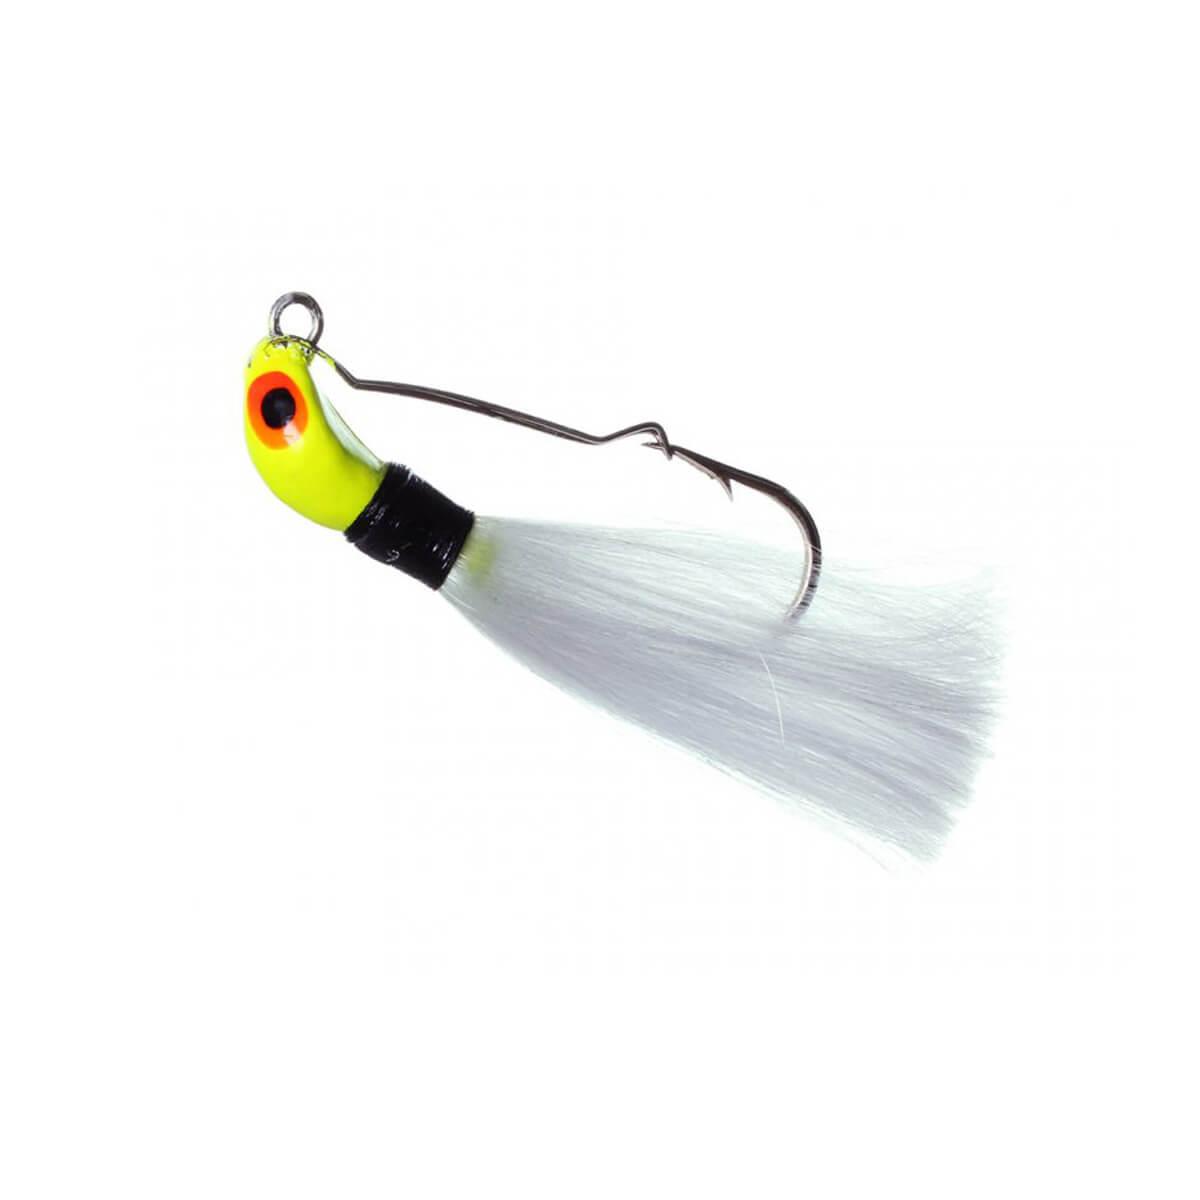 Jig Lori Antienrosco M 12 g  - Pró Pesca Shop